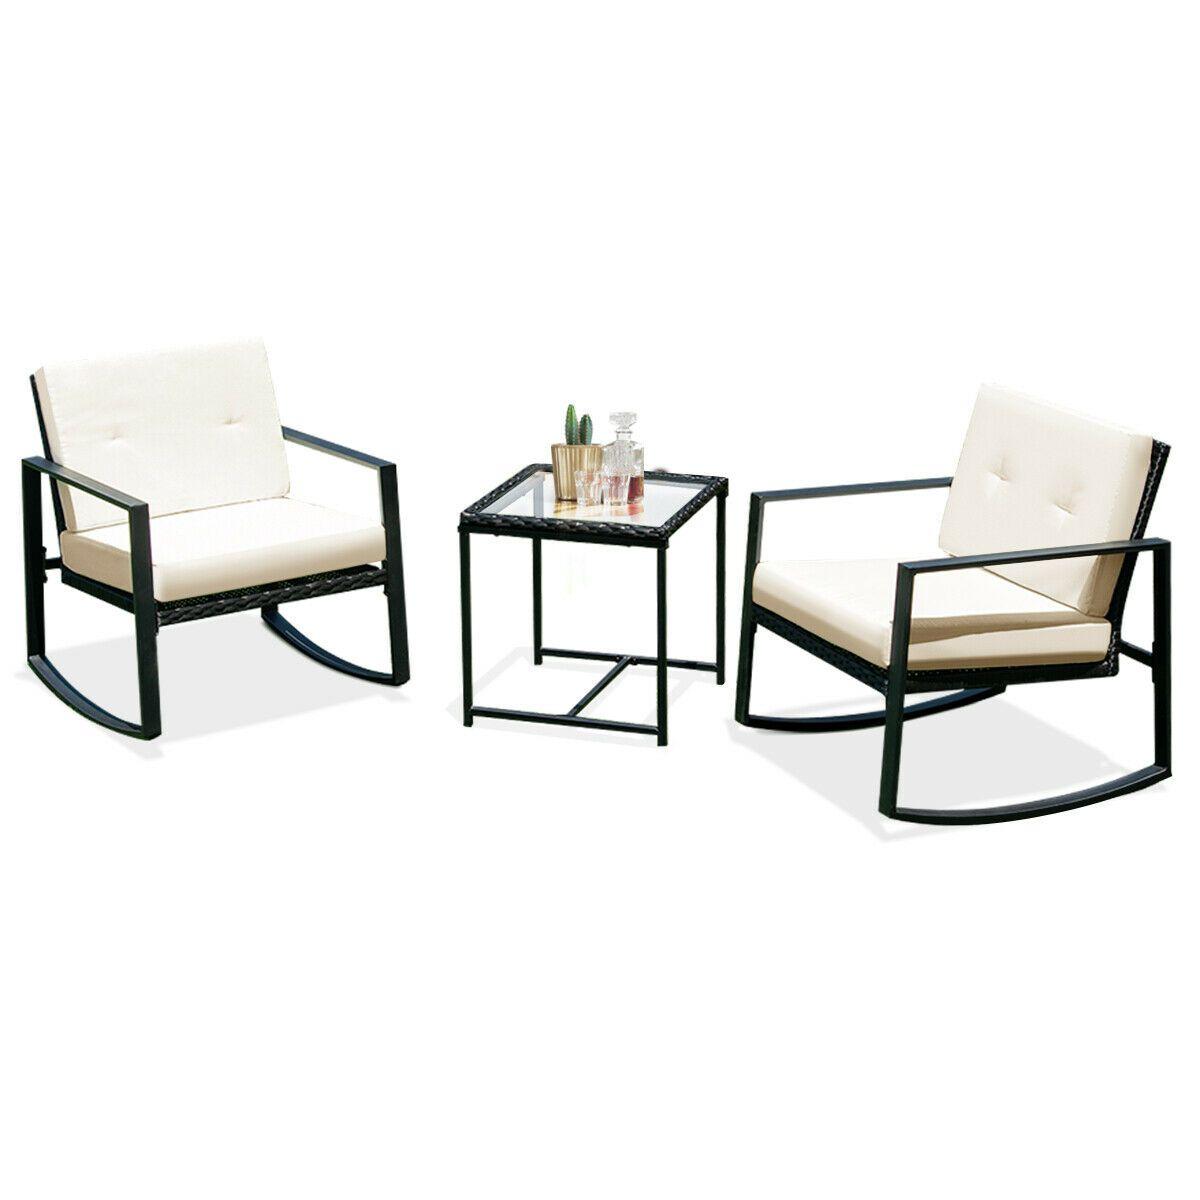 Details About 3Pcs Rattan Wicker Rocking Chair Bistro 400 x 300